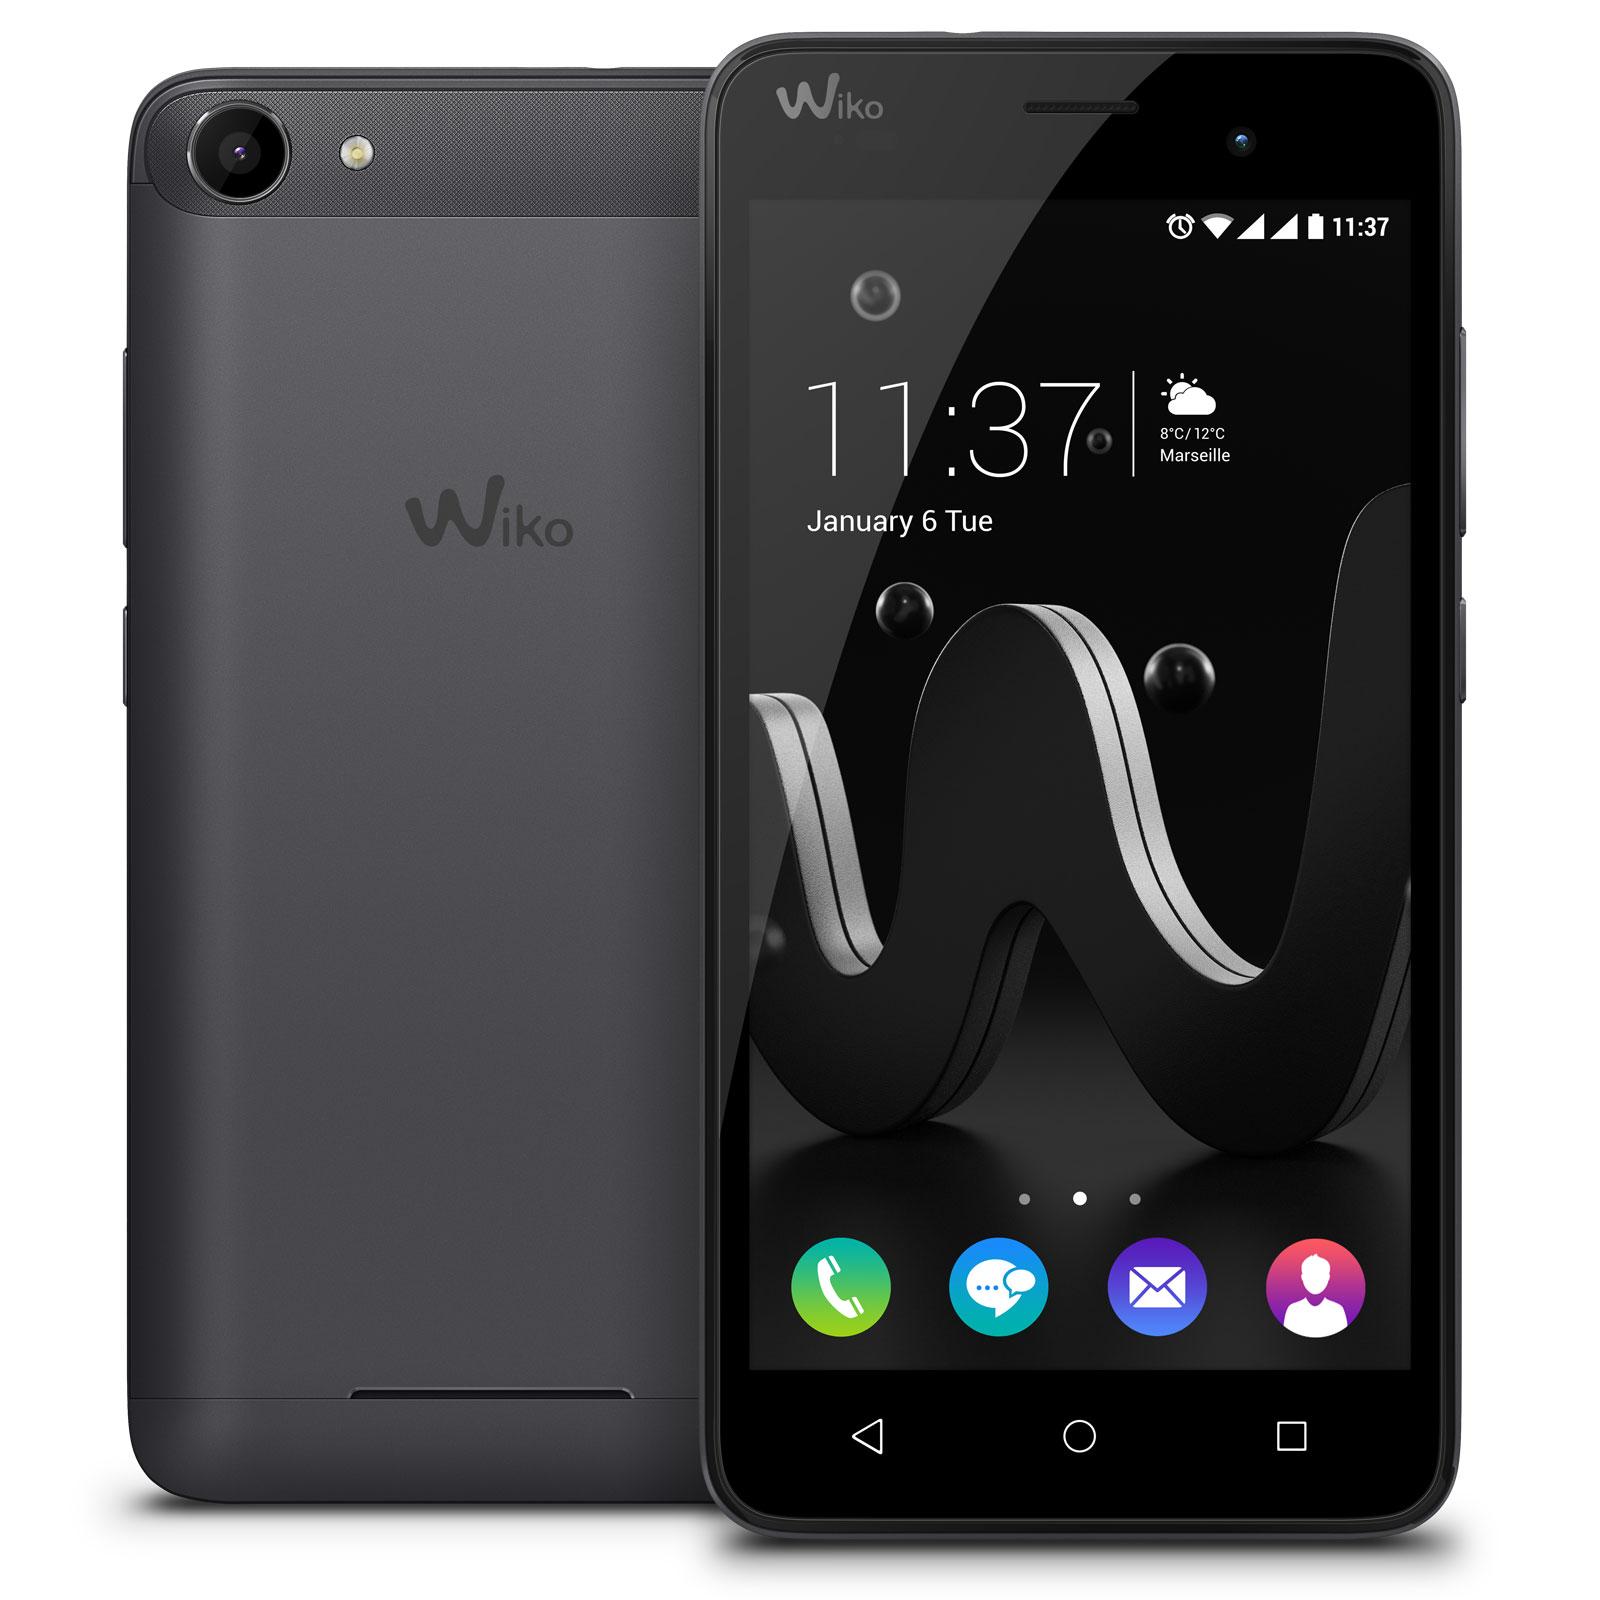 wiko jerry noir mobile smartphone wiko sur. Black Bedroom Furniture Sets. Home Design Ideas